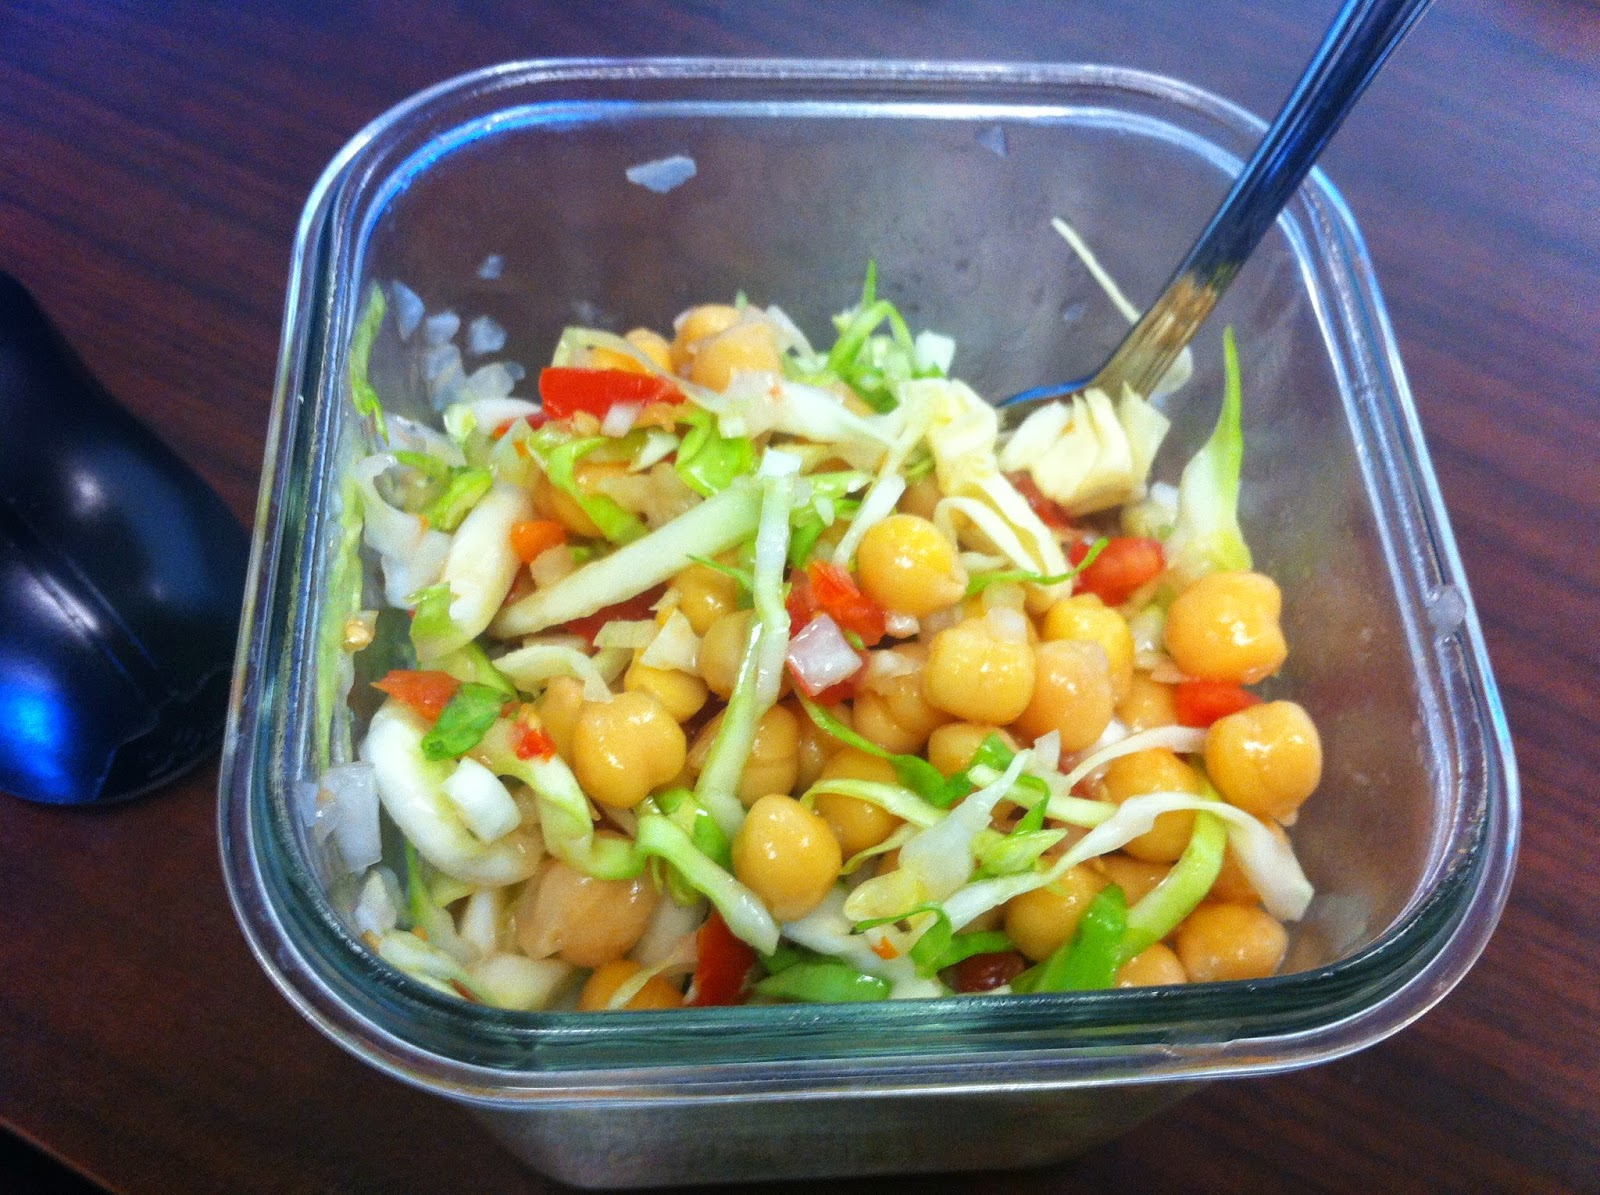 Garbanzo and cabbage salad